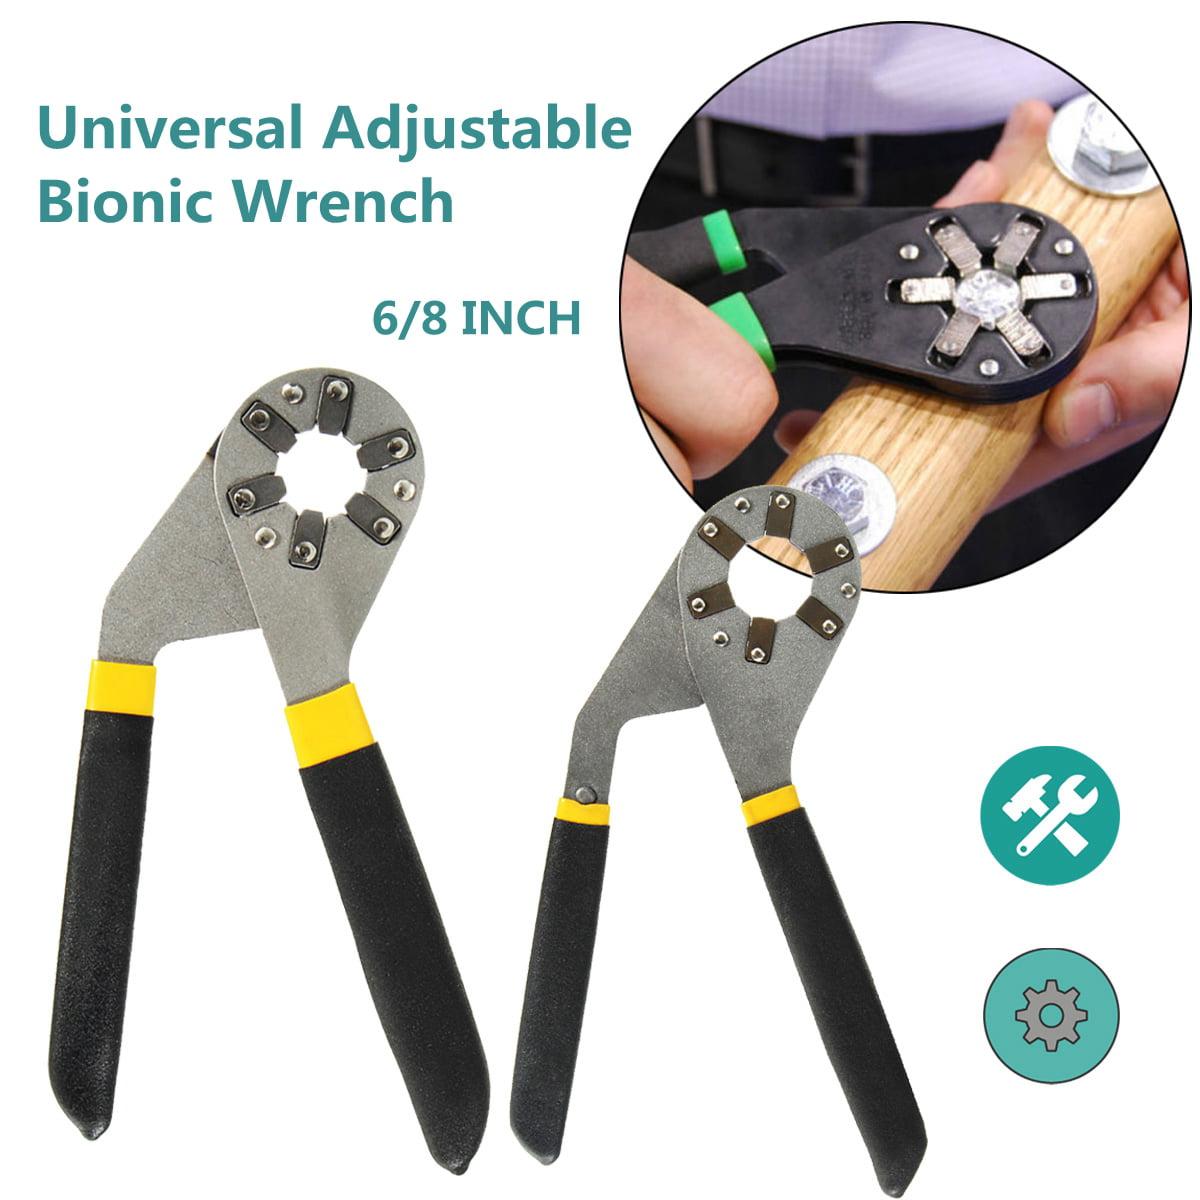 6/8 inch Adjustable Hexagon Universal Quick Magic Wrench Adjustable Bionic Plier